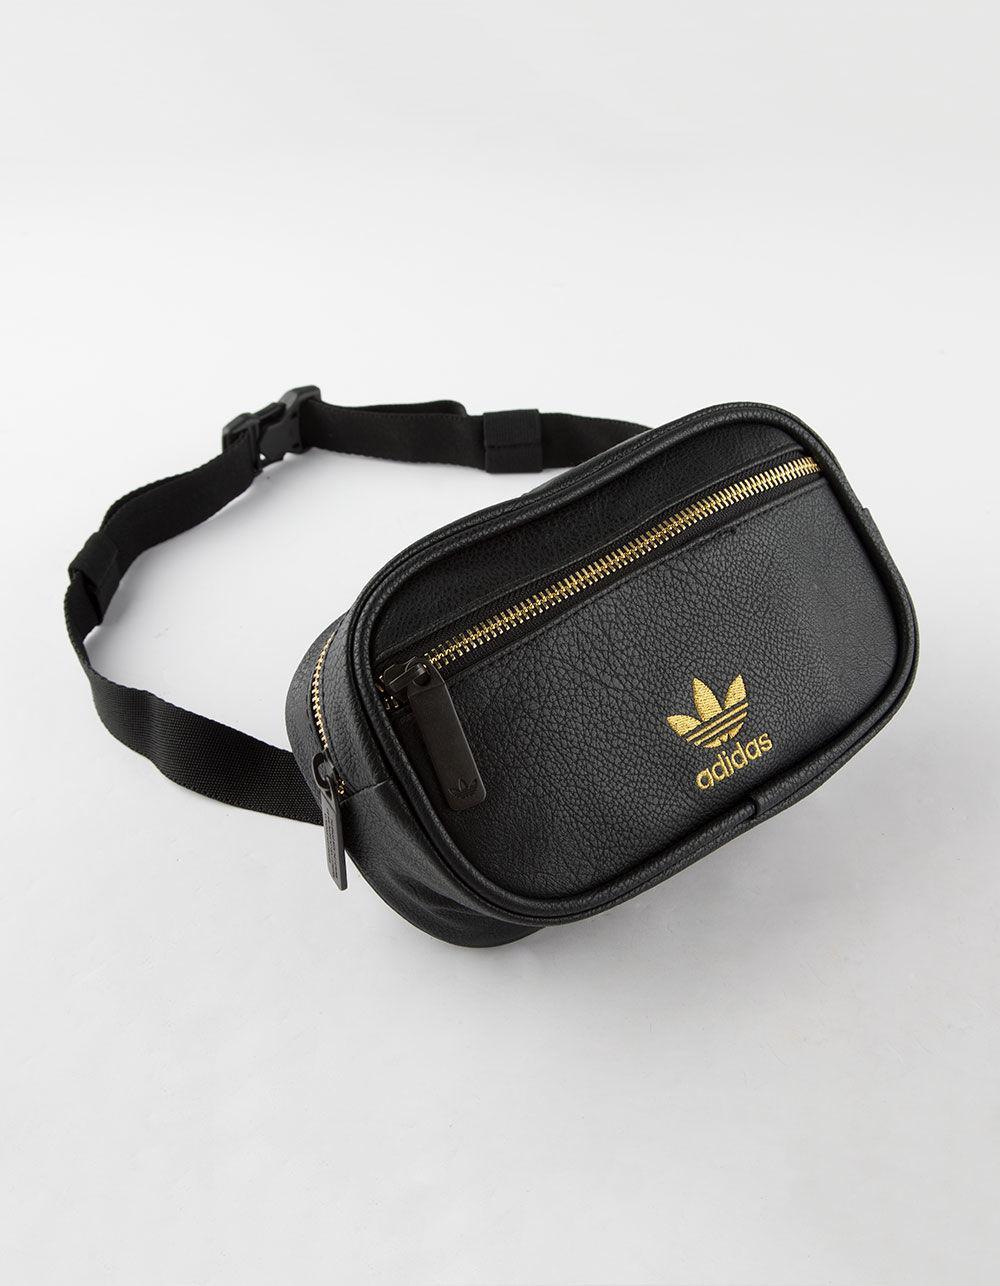 3cd356de8ca8 Lyst - adidas Originals Pebbled Faux Leather Fanny Pack in Black